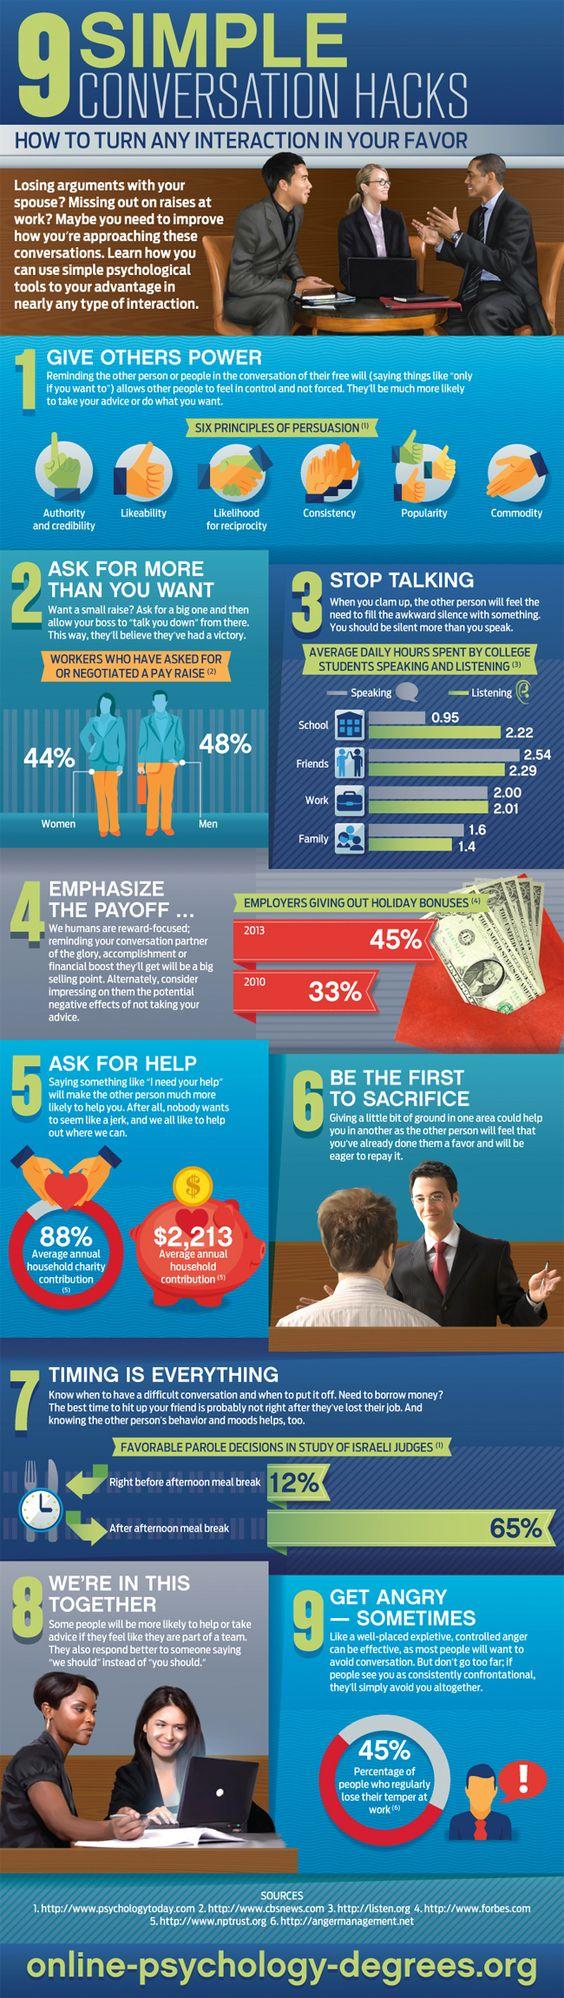 salary negotiation tactics that work online business hacks 9 salary negotiation tactics that work